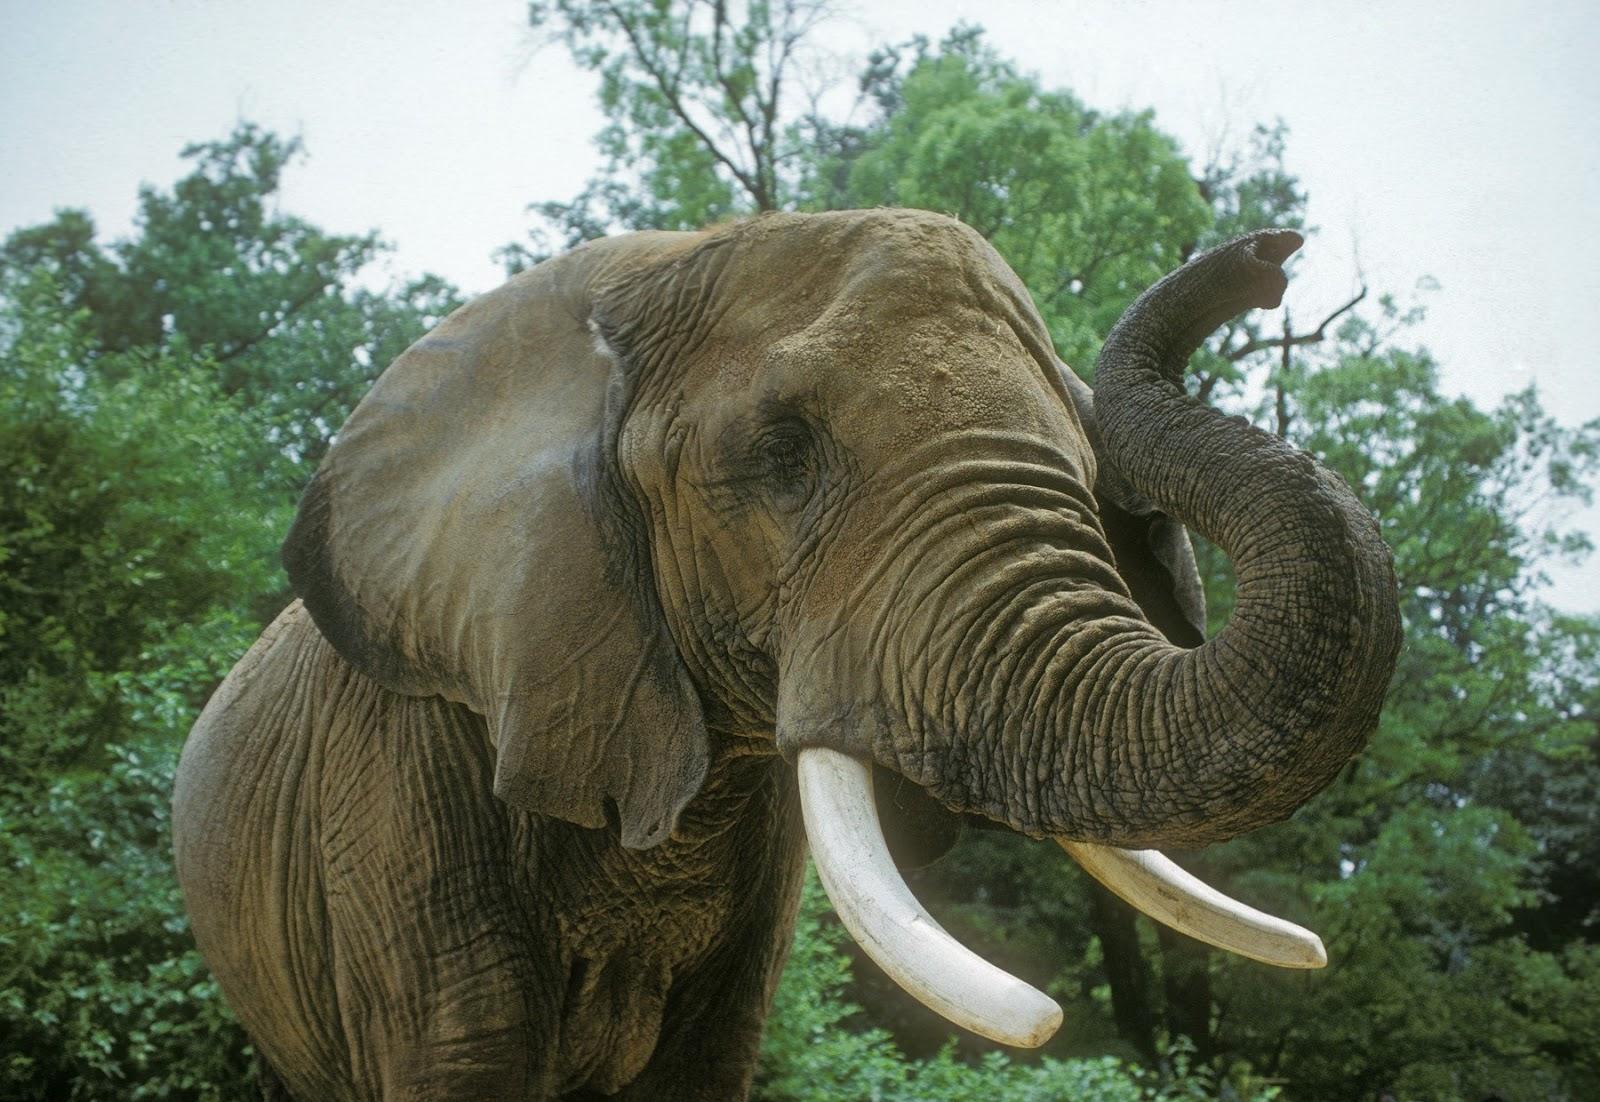 Animal Zoo Life: |Elephant|Facts about elephants|Indian ...